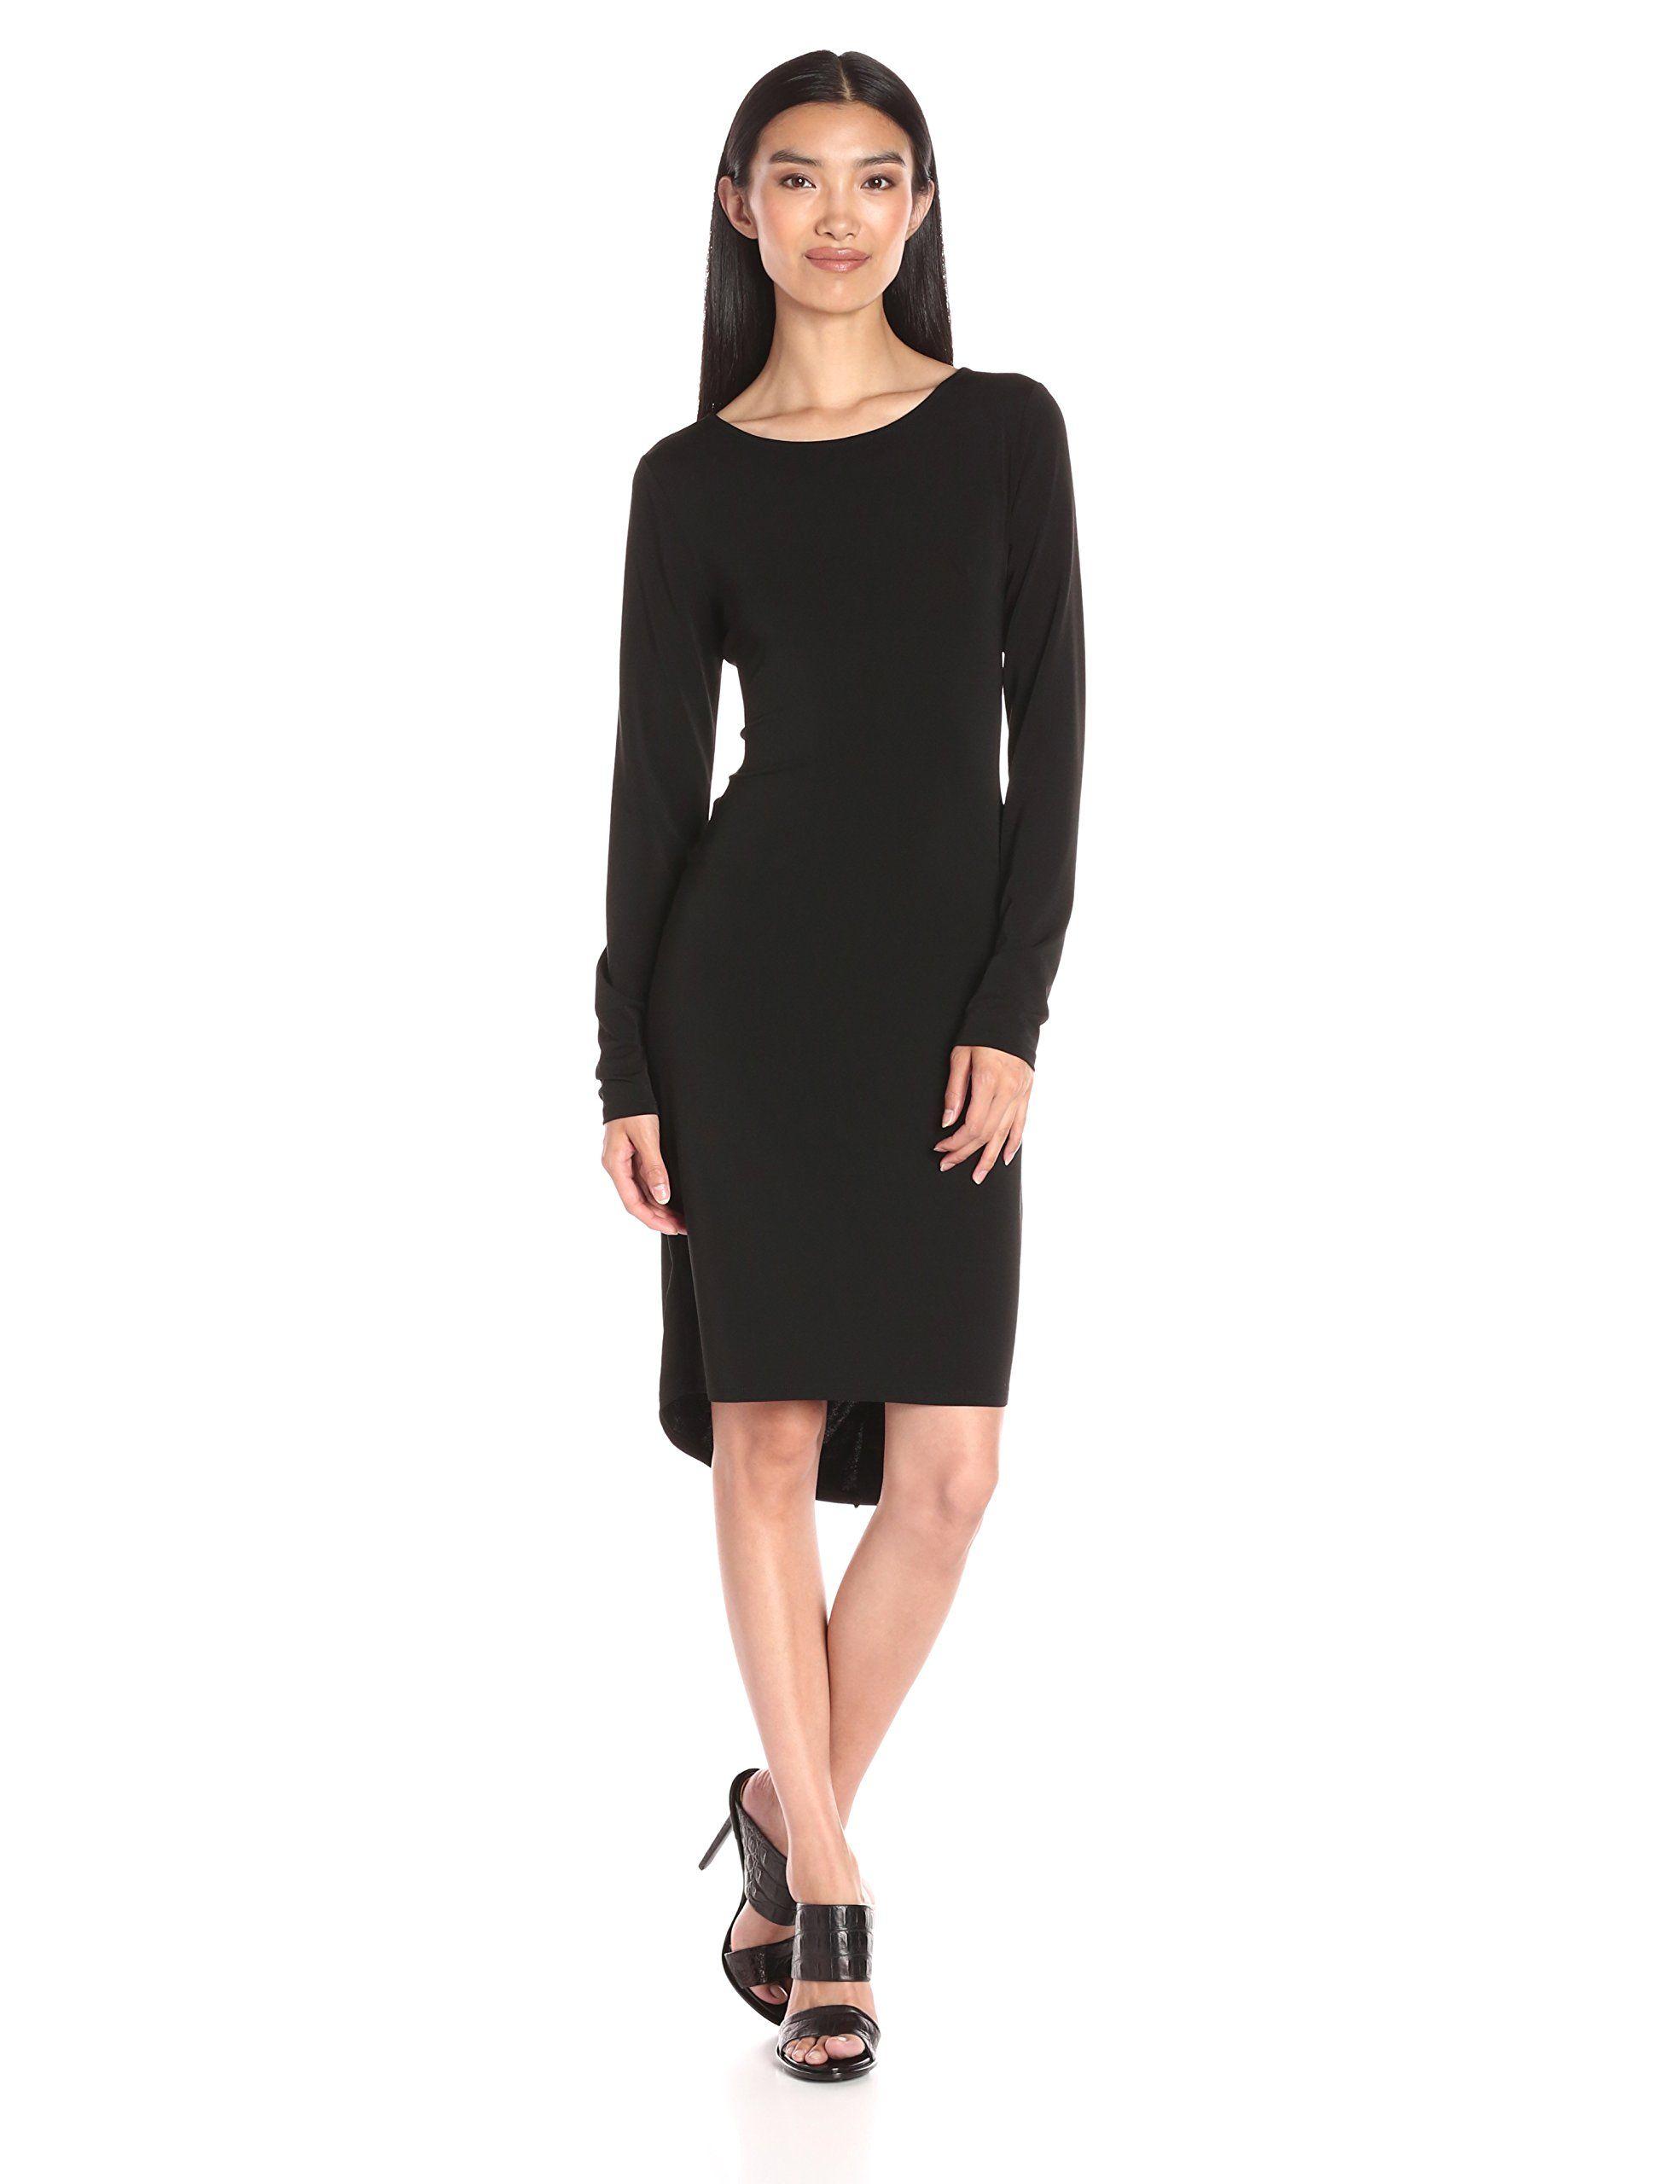 Black t shirt dress knee length - Black Bcbgmax Azria Women S Celia Long Sleeve T Shirt Dress